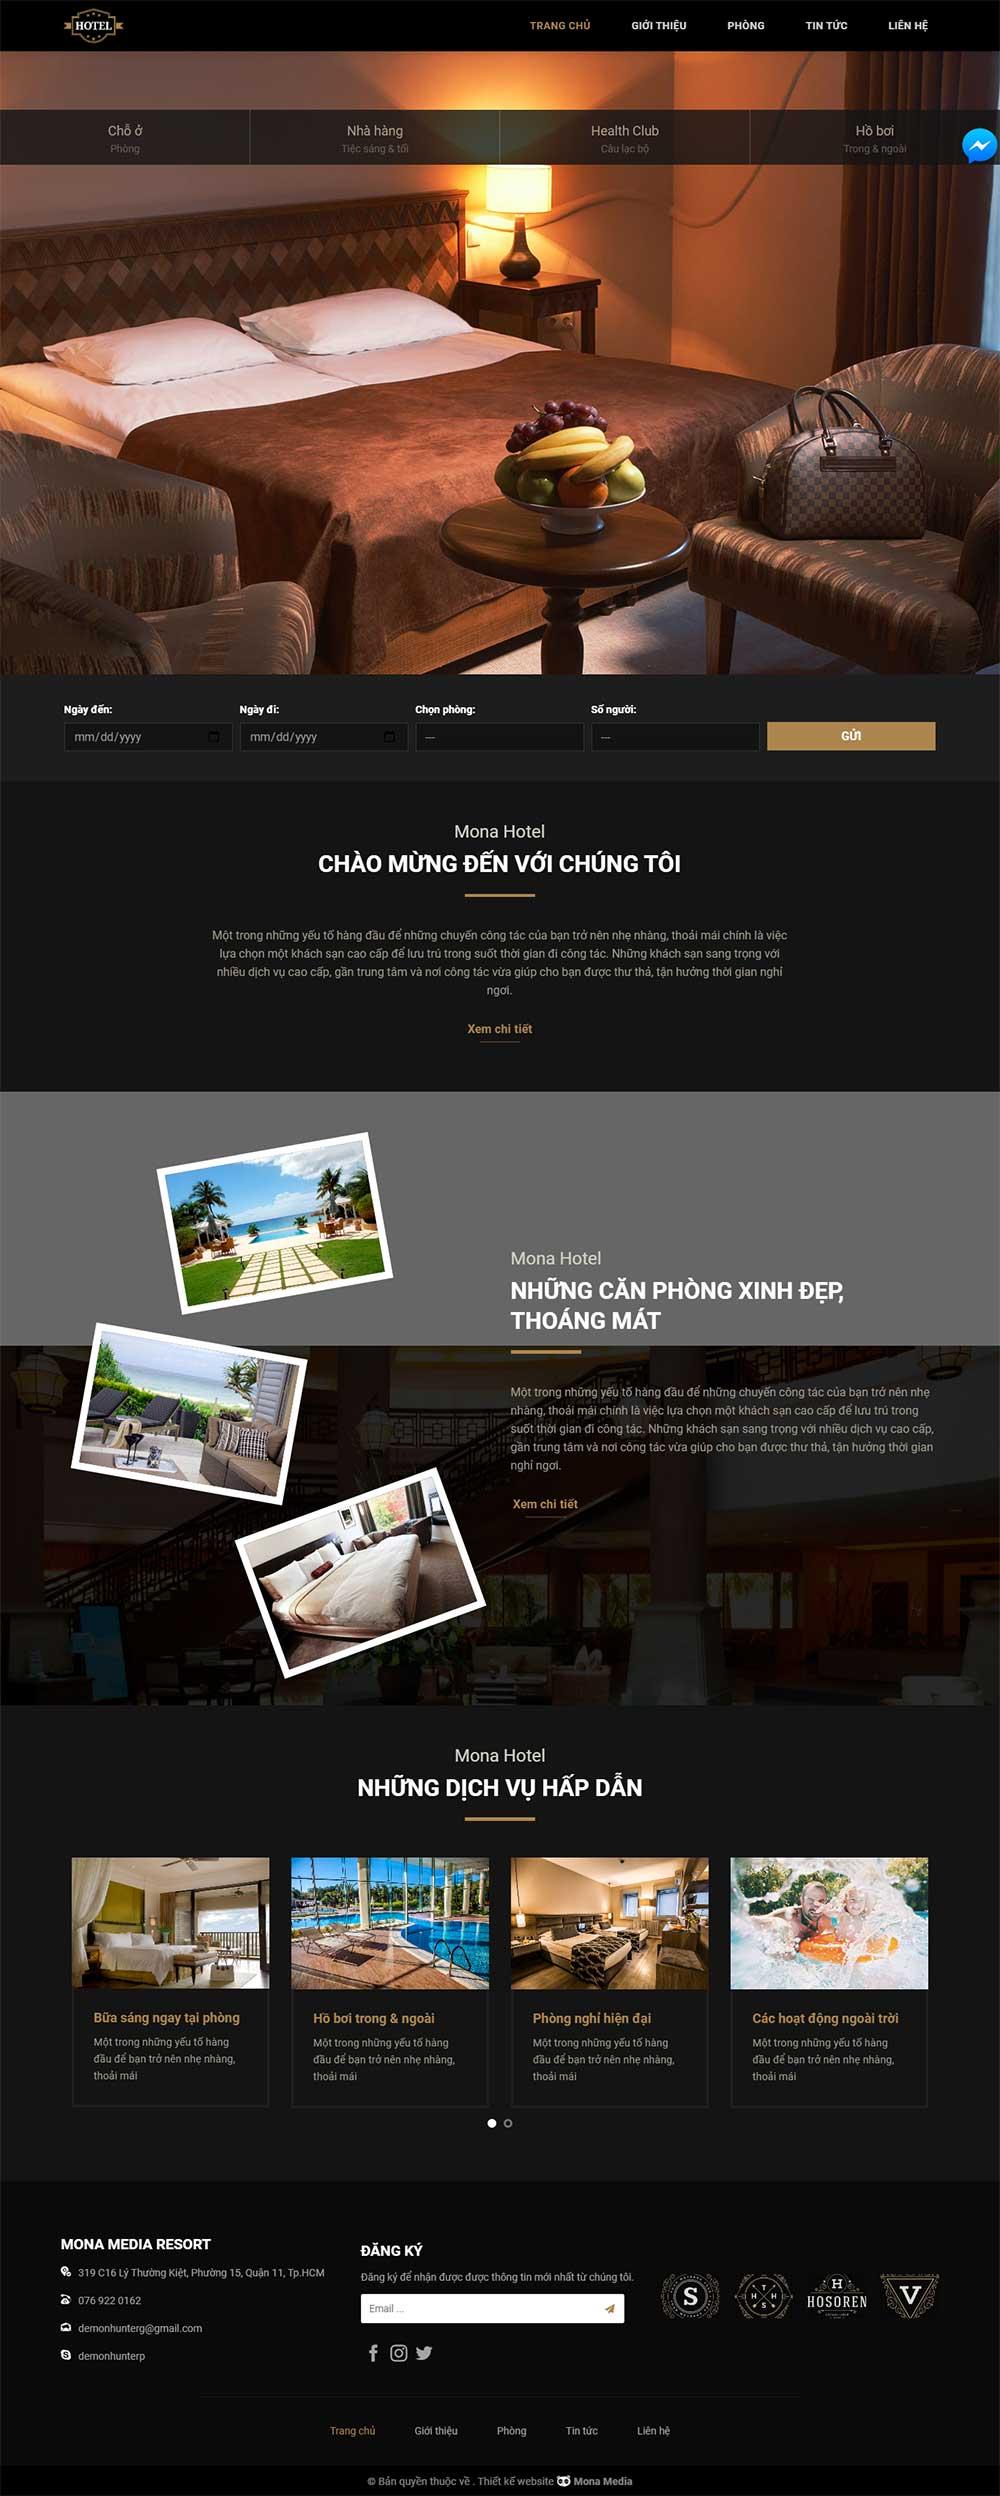 Mẫu Website dịch vụ Khách Sạn Leisure